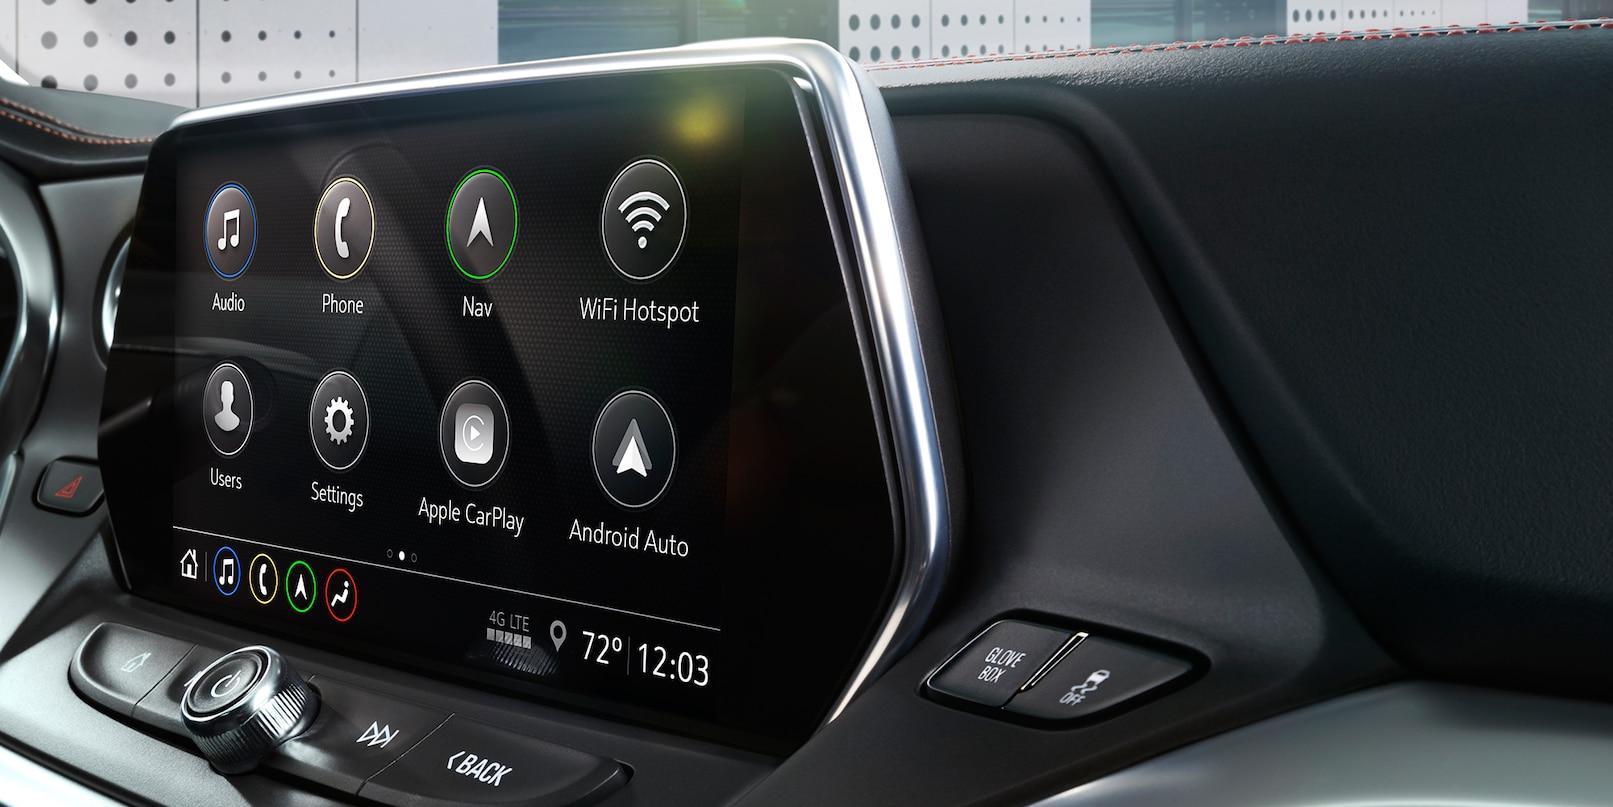 Touchscreen in the 2019 Blazer